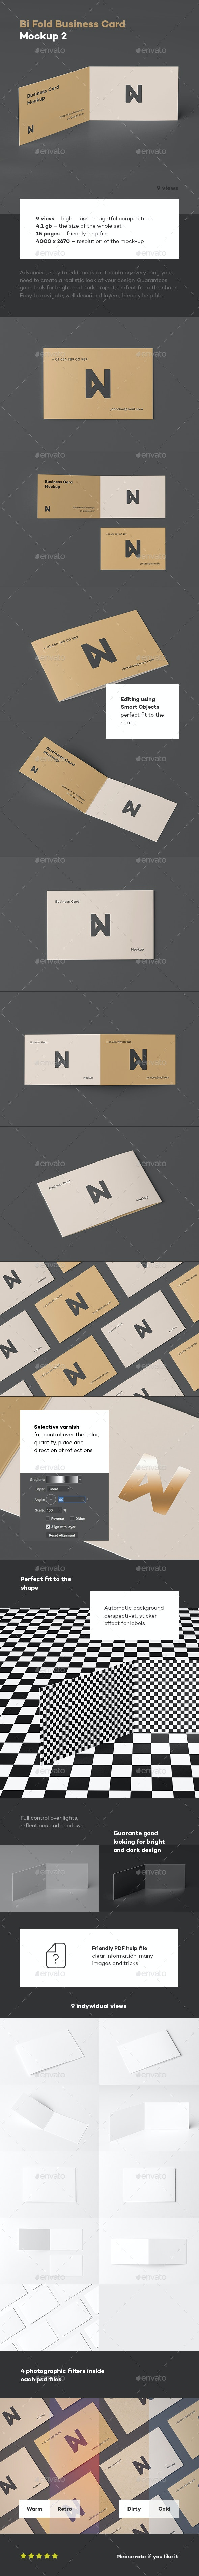 Bi-Fold Business Card Mock-up 2 - Business Cards Print